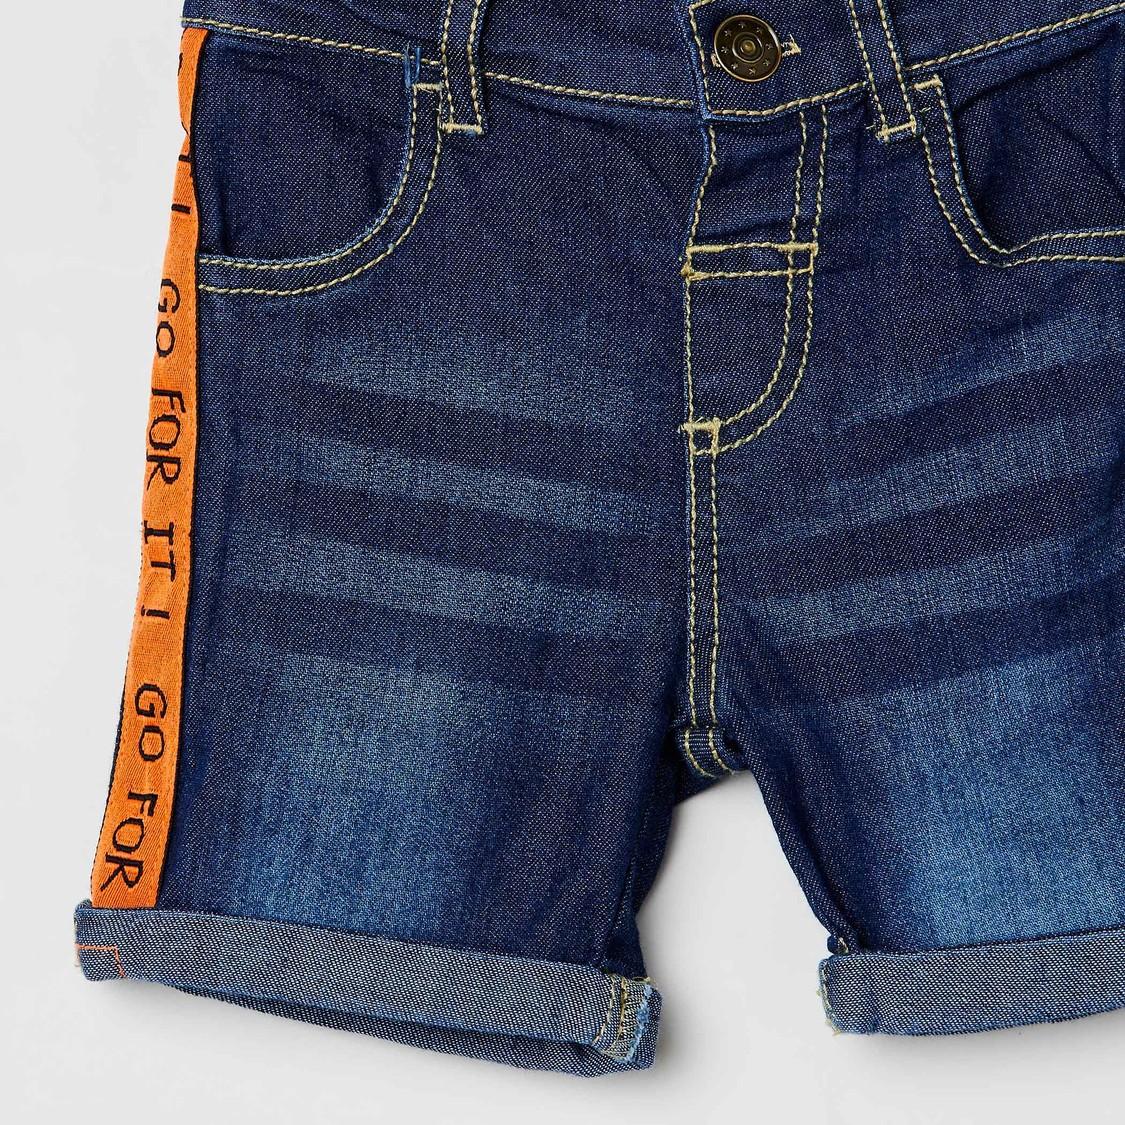 MAX Printed Tape-Detailed Denim Shorts